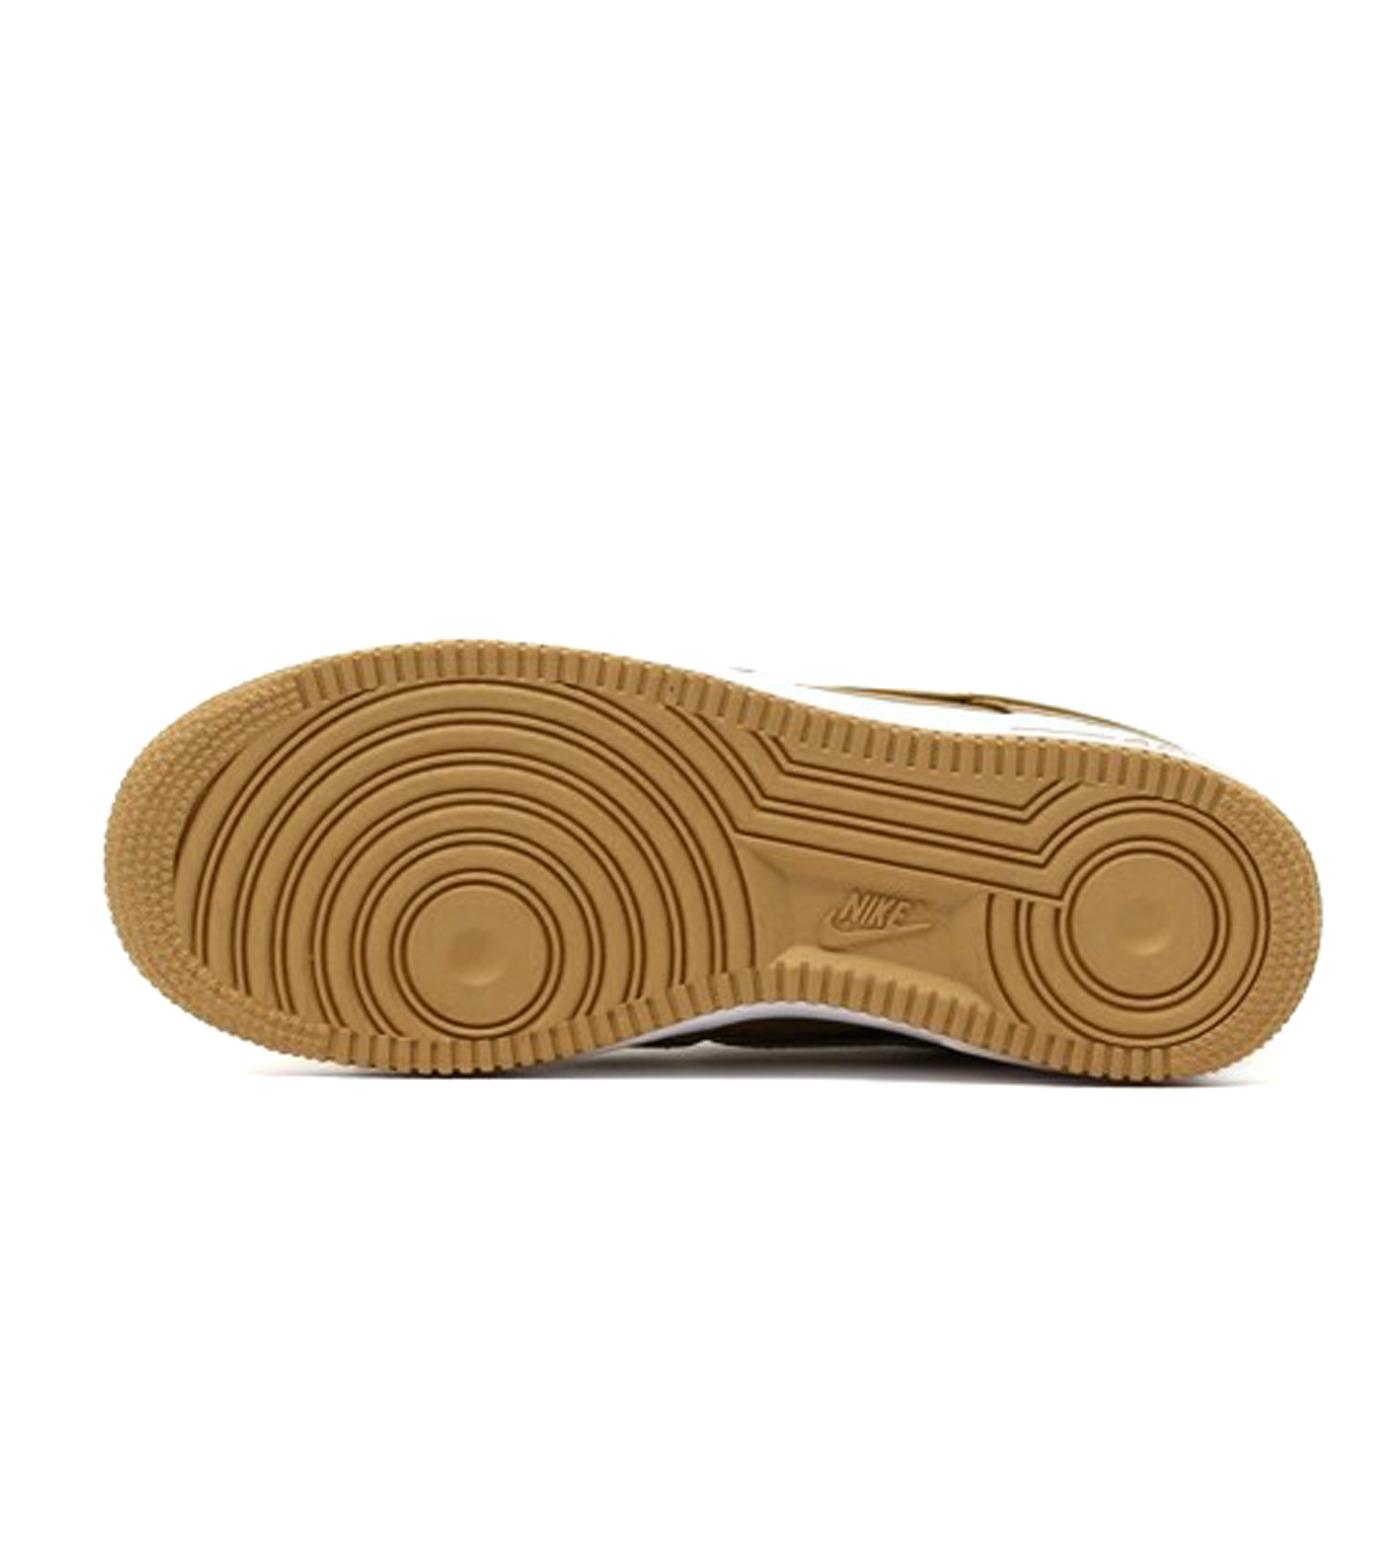 NIKE(ナイキ)のAIR FORCE 1 07 LV8-GOLD(シューズ/shoes)-718152-700-2 拡大詳細画像2